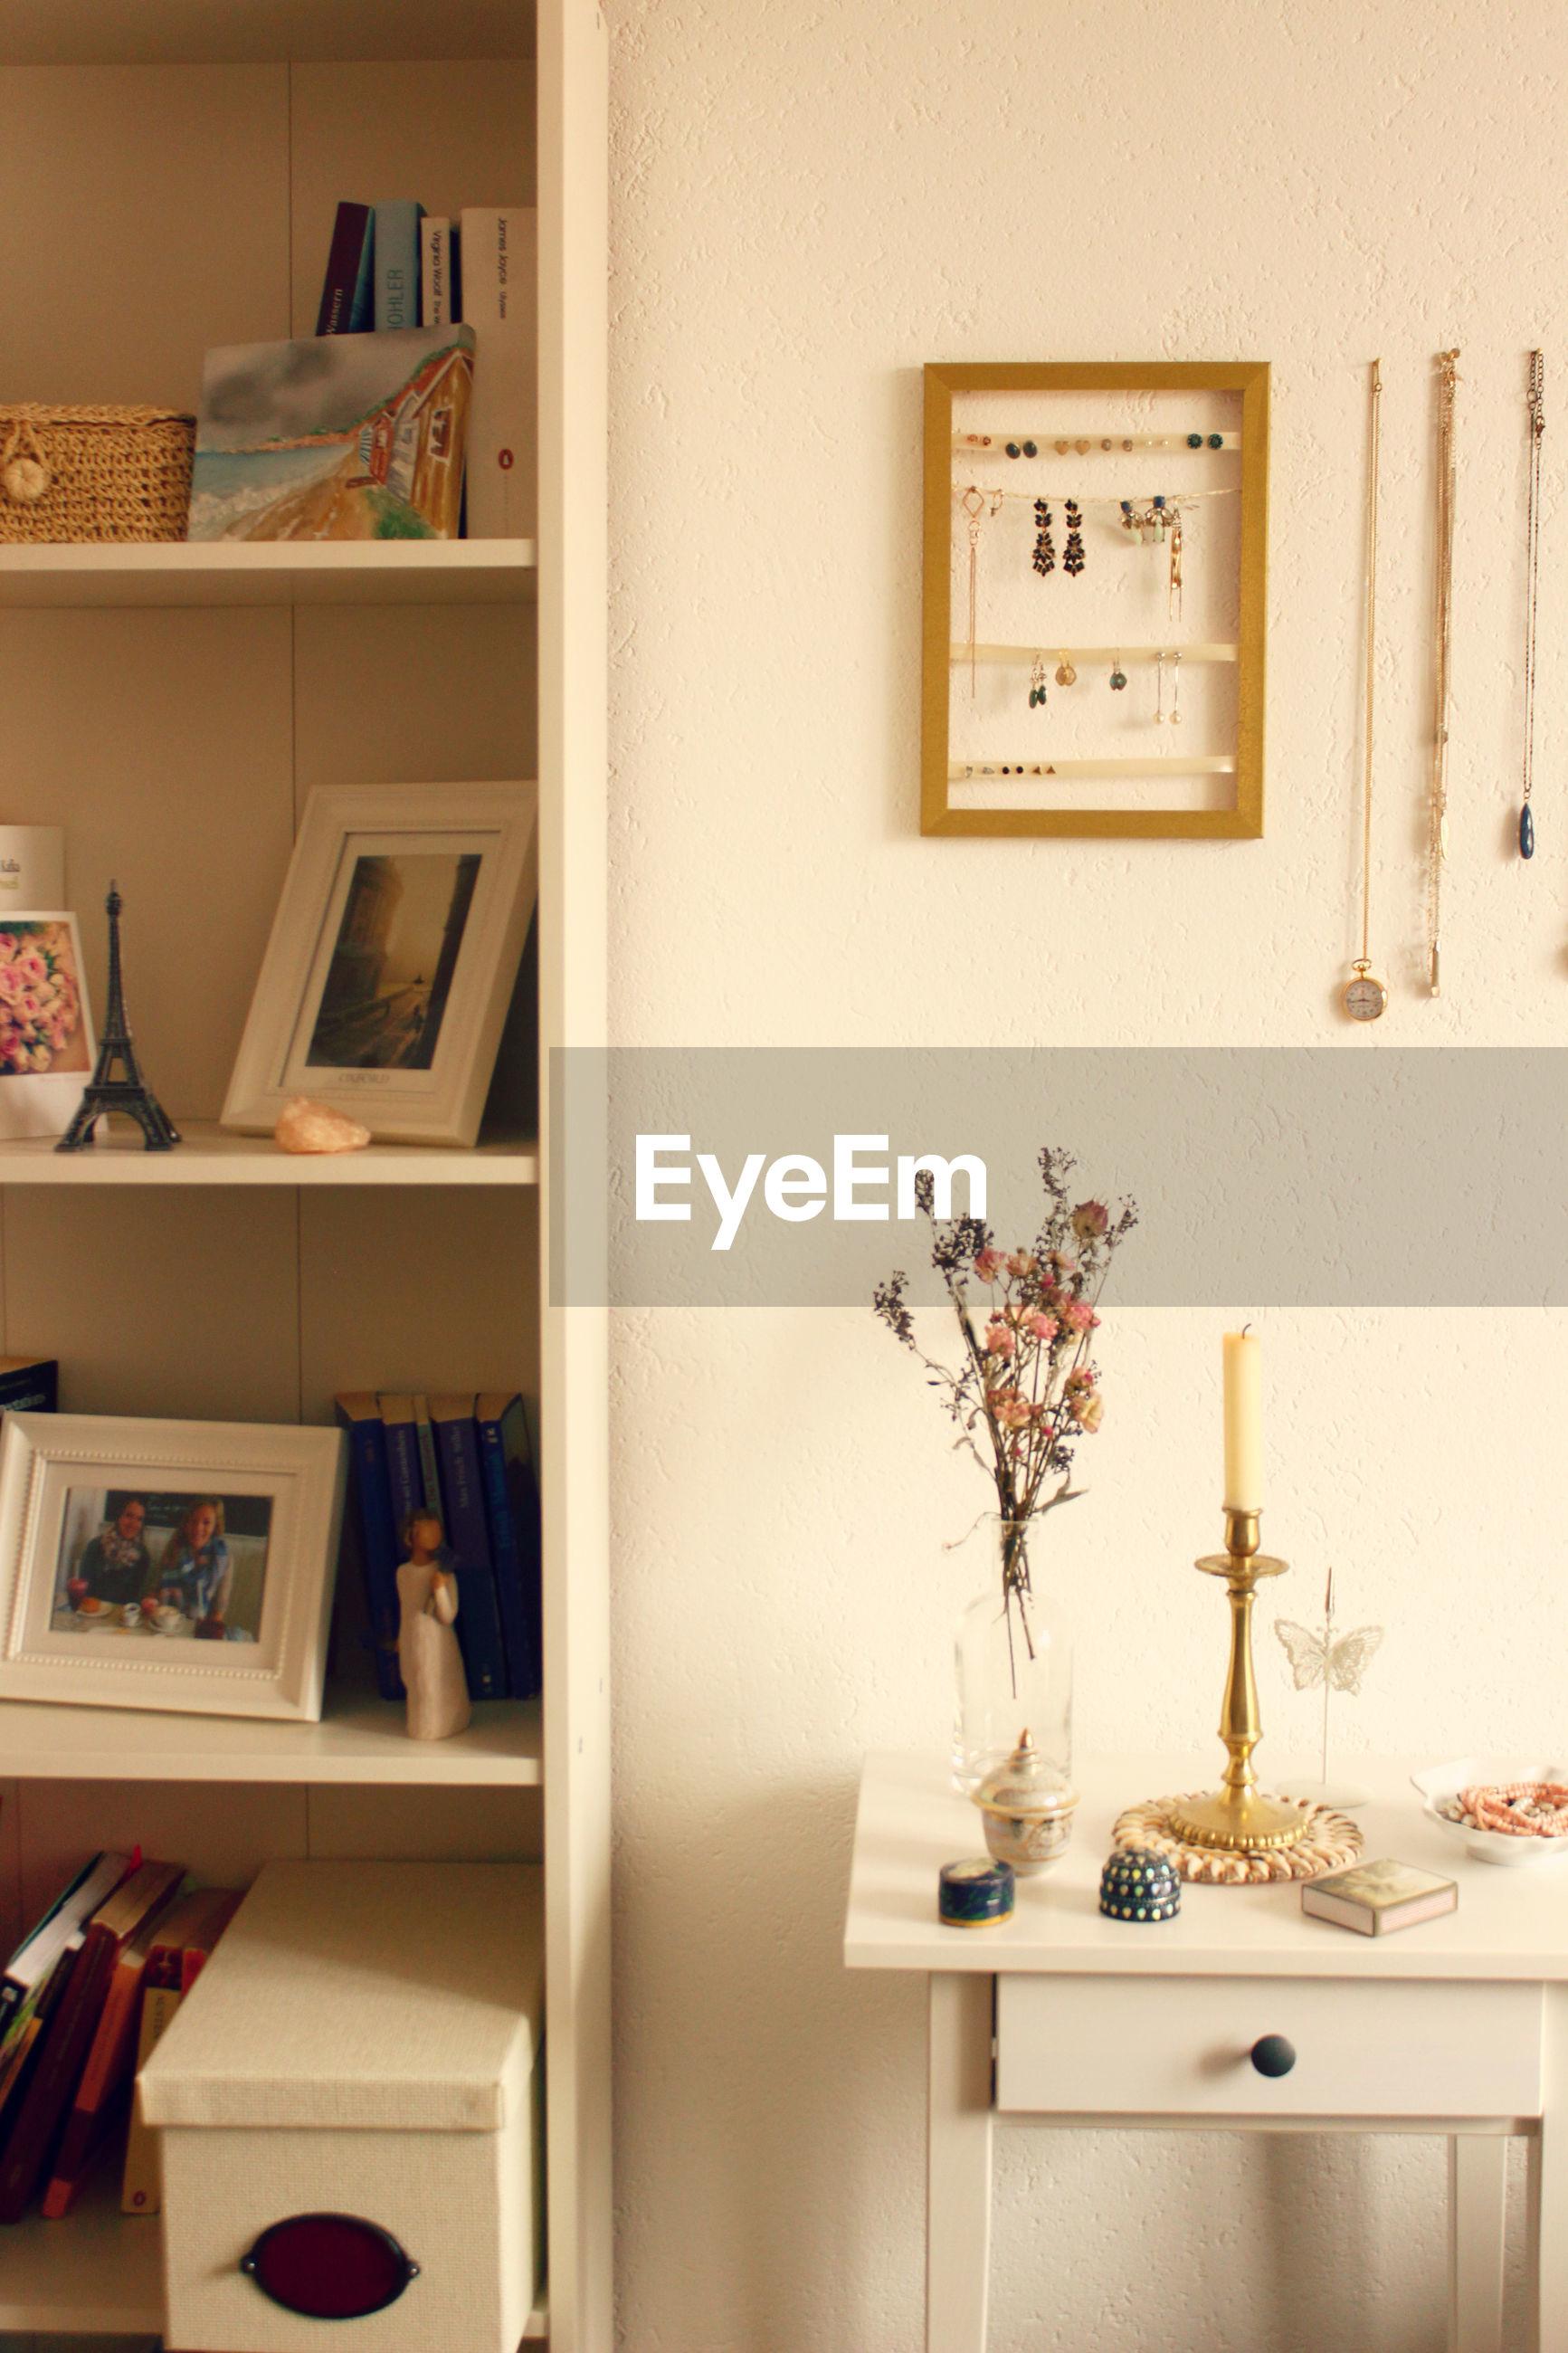 indoors, home interior, shelf, domestic room, no people, cabinet, home showcase interior, domestic life, architecture, bookshelf, bedroom, day